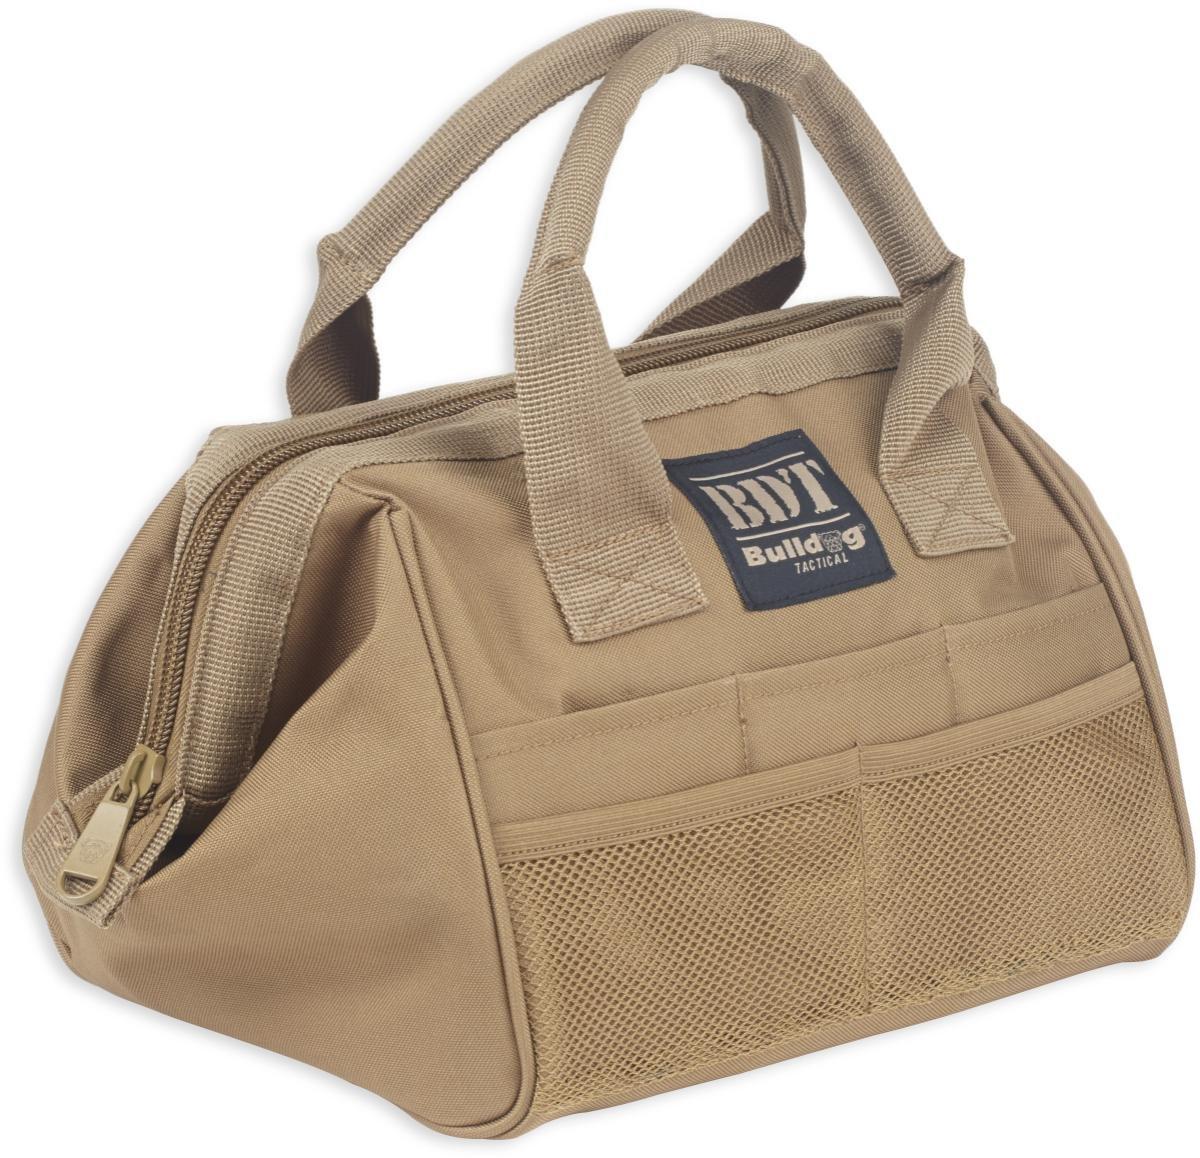 Bulldog Cases BDT405B Tactical, Range Bag, Black, Nylon, Medium